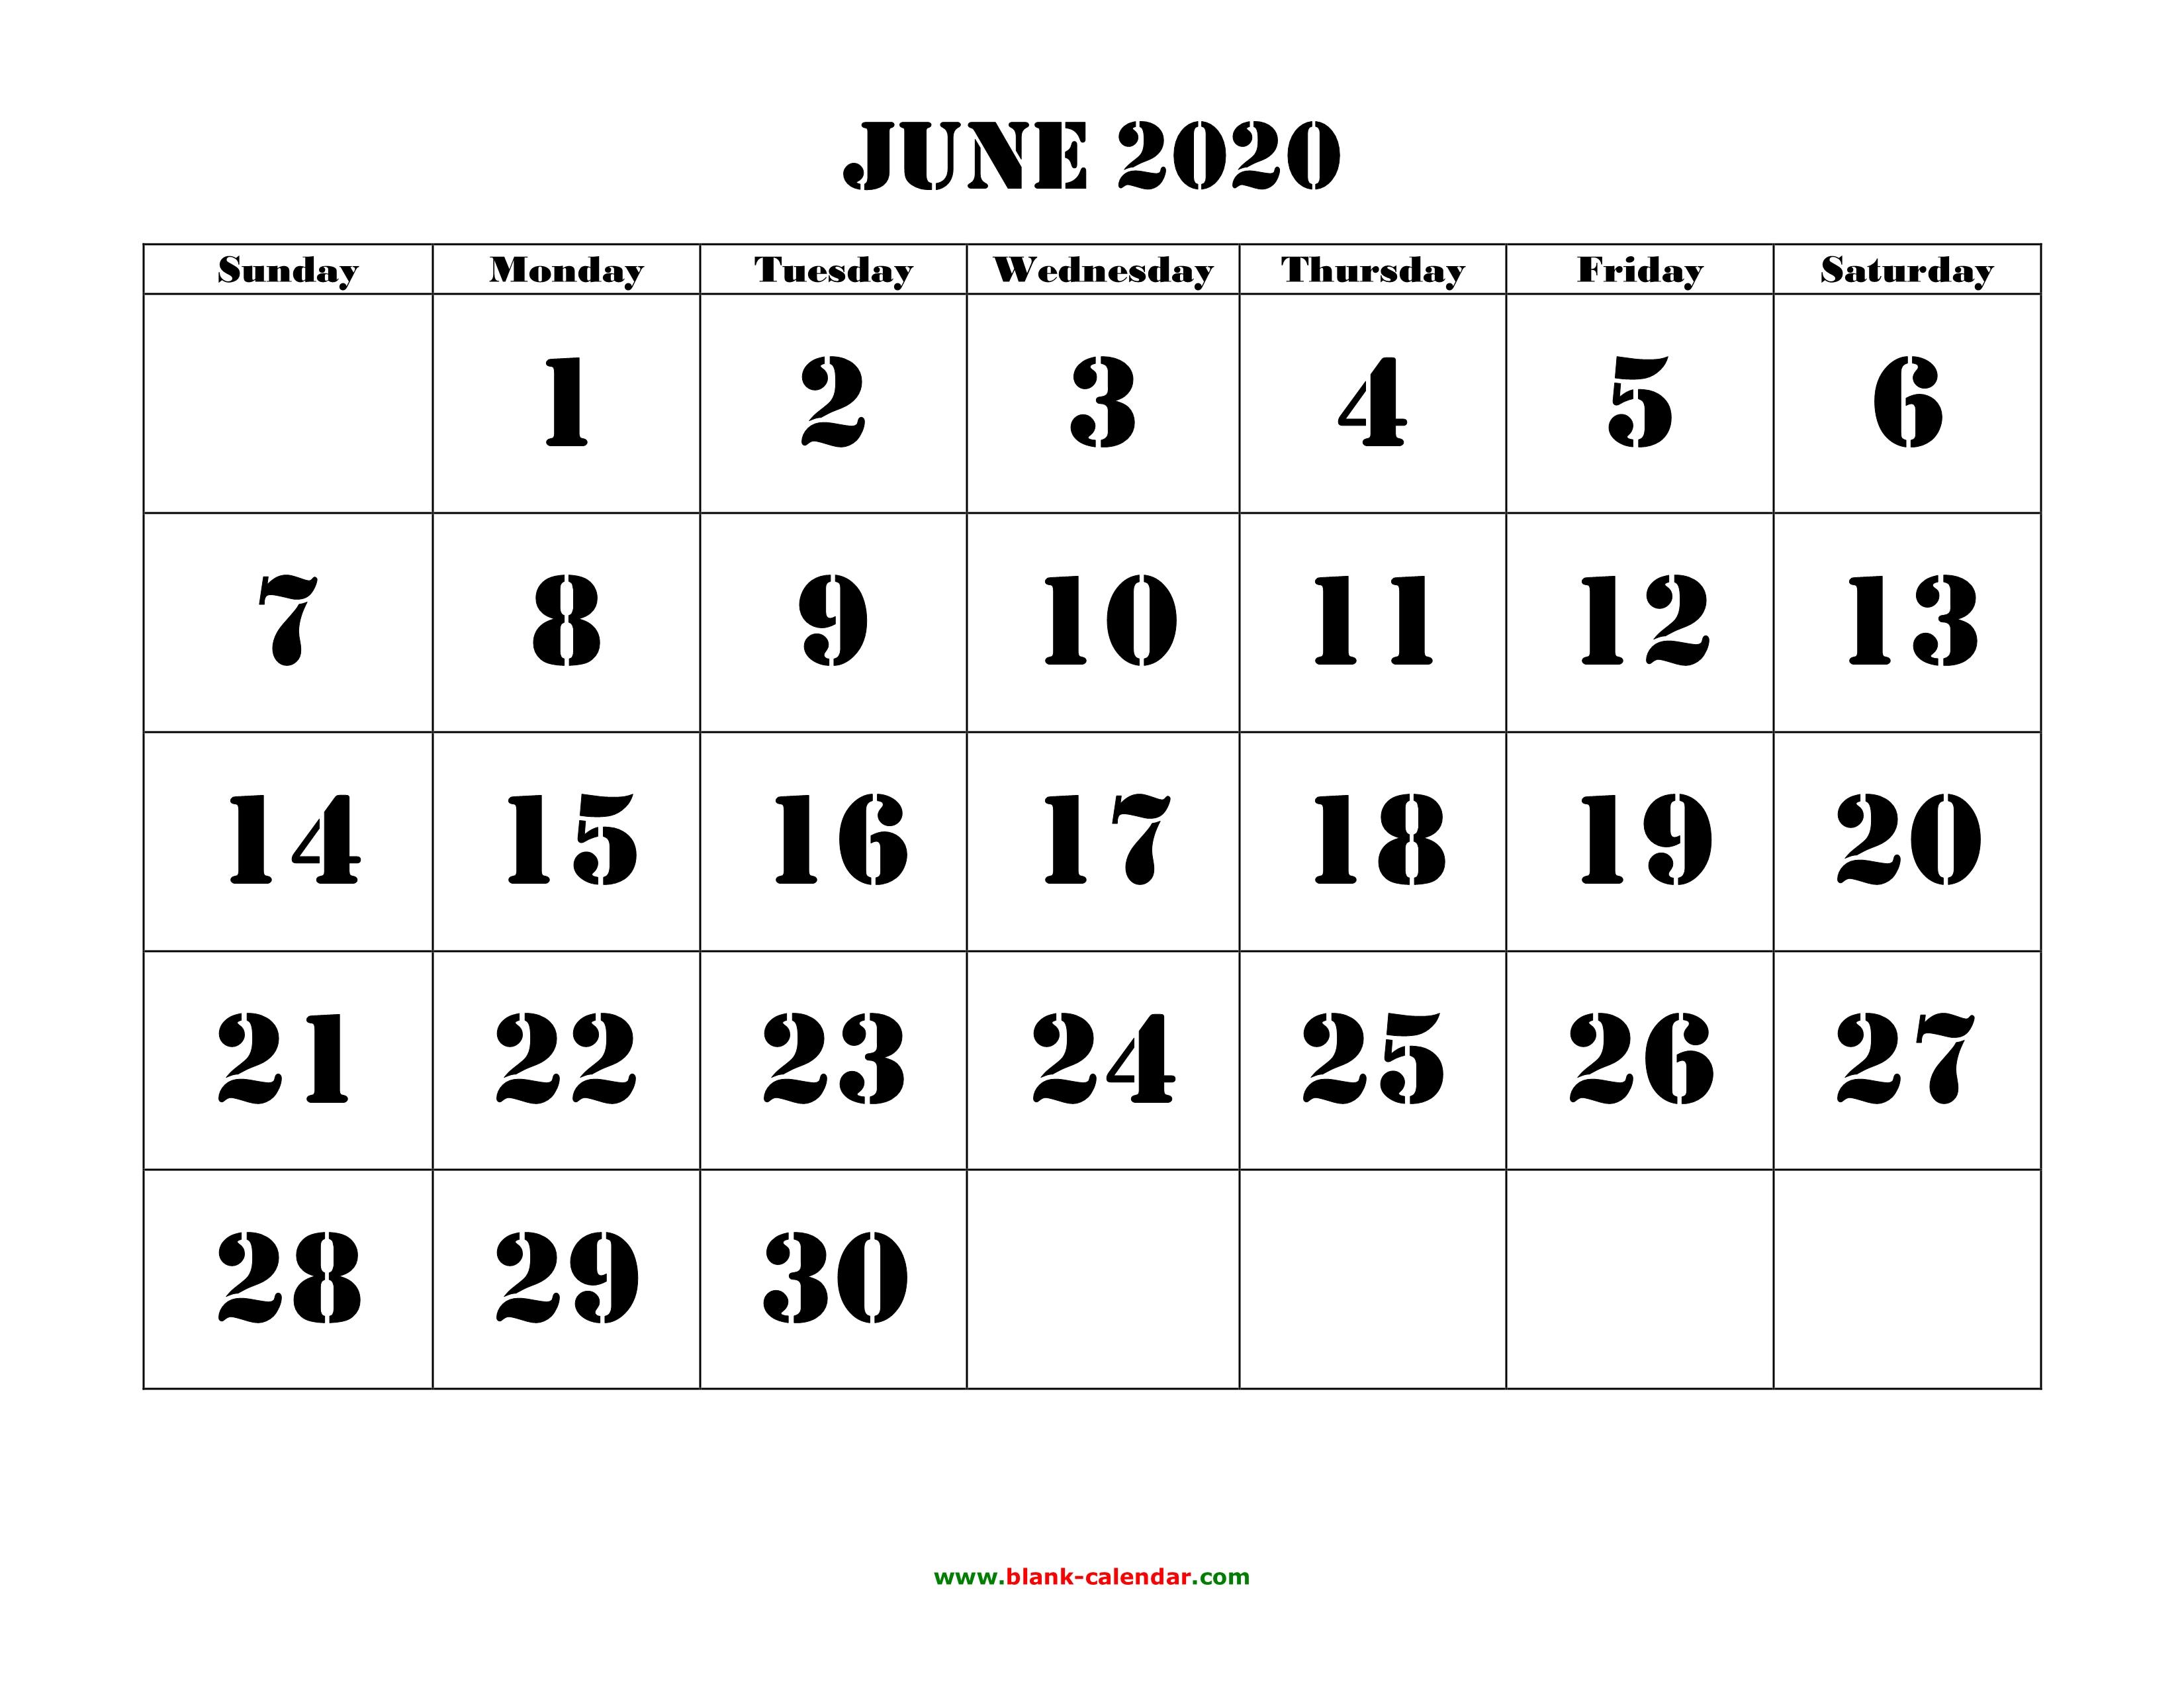 June 2020 Printable Calendar   Free Download Monthly Calendar Templates pertaining to 2020 Free Printable Calendar Large Numbers